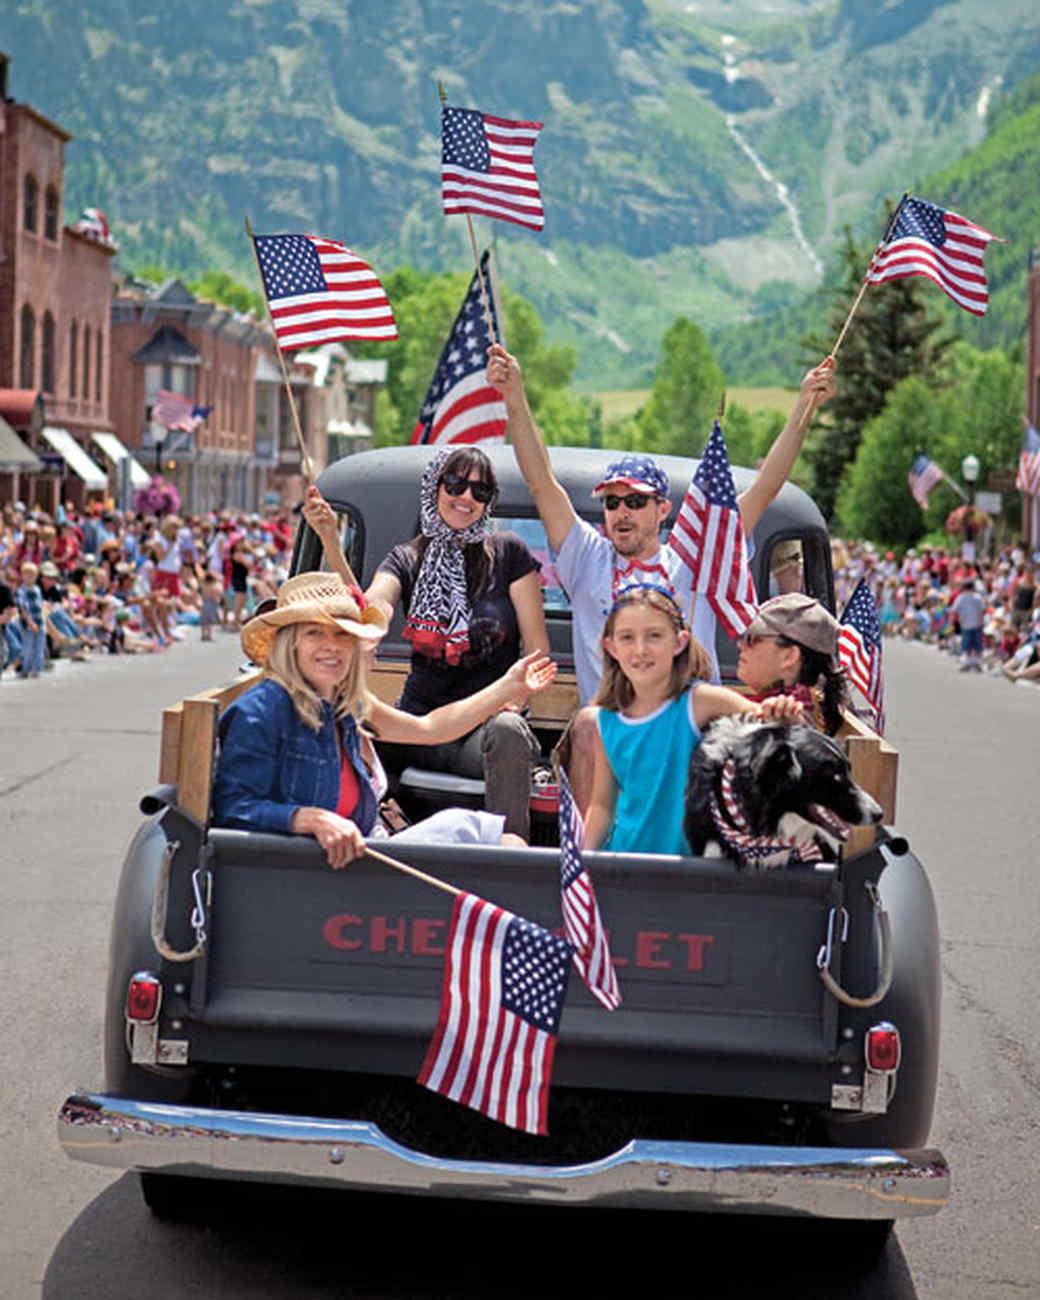 sc 1 st  Martha Stewart & Fourth of July Bike Parade | Martha Stewart